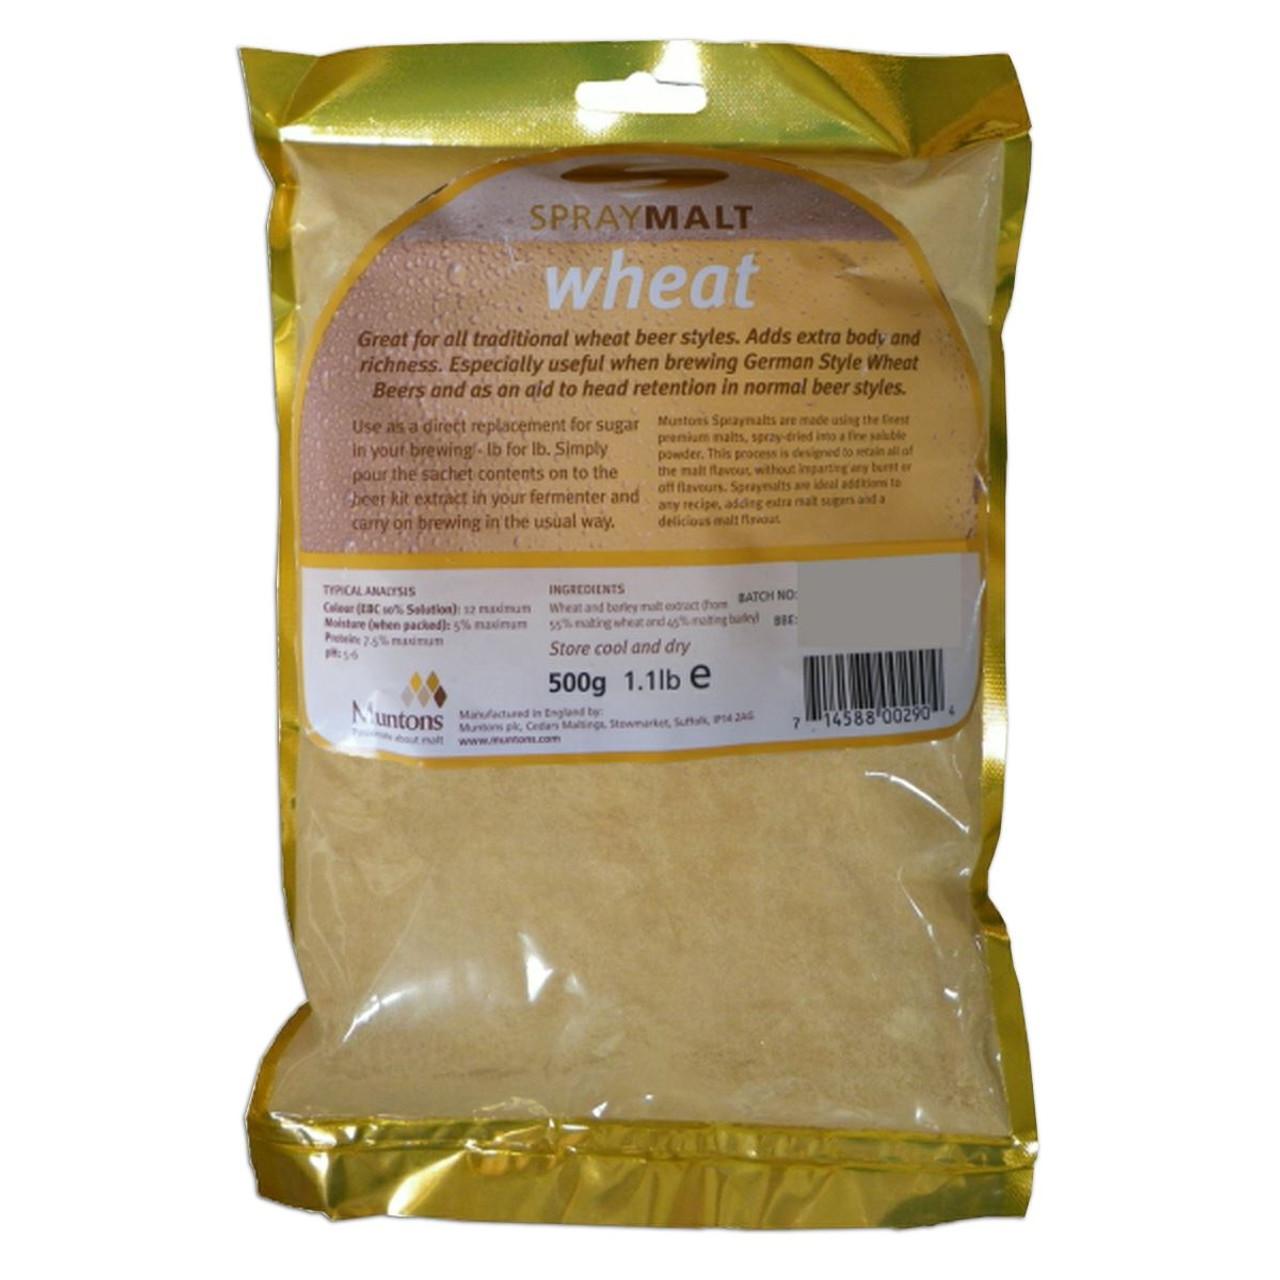 Muntons Spraymalt WHEAT 500g 100% Malt Extract Home Brew Beer Improver